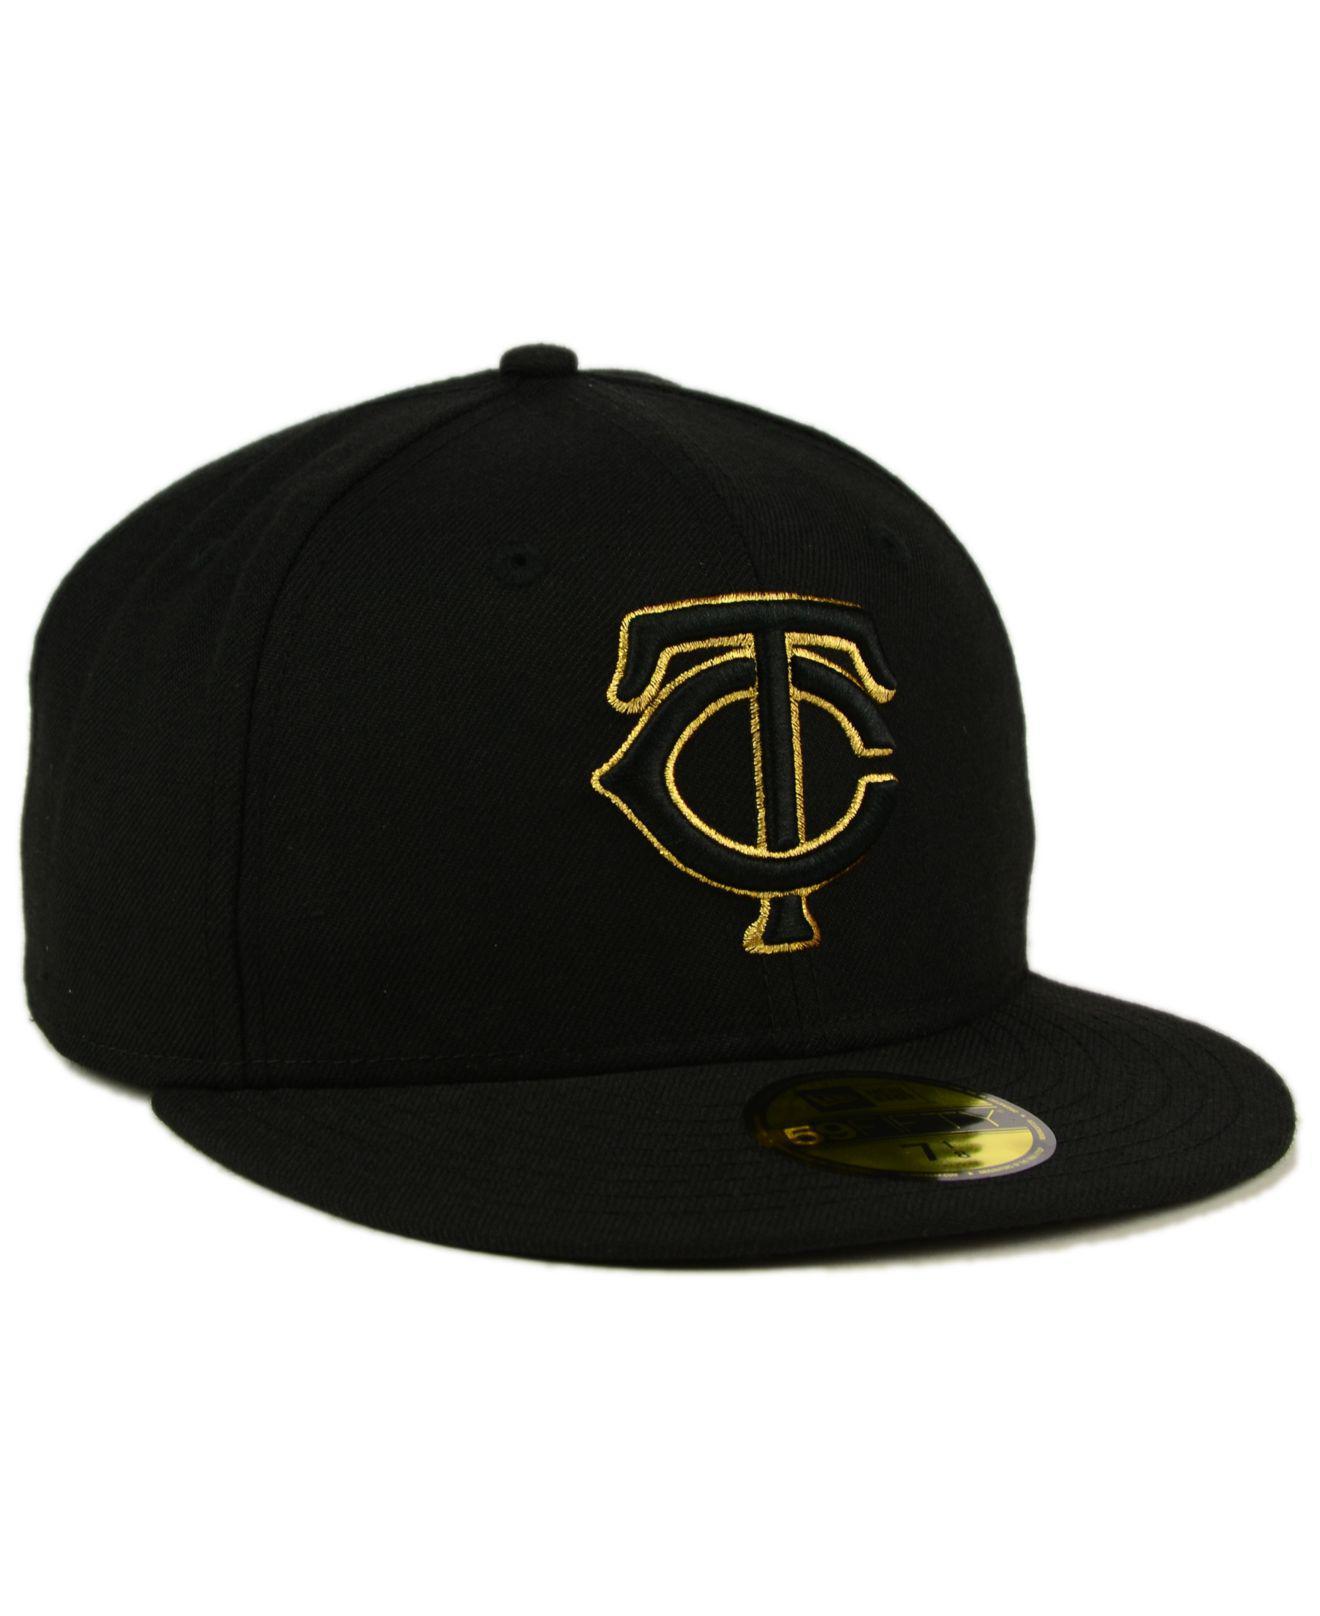 reputable site 993c6 930bc KTZ Minnesota Twins Black On Metallic Gold 59fifty Cap in Black for ...